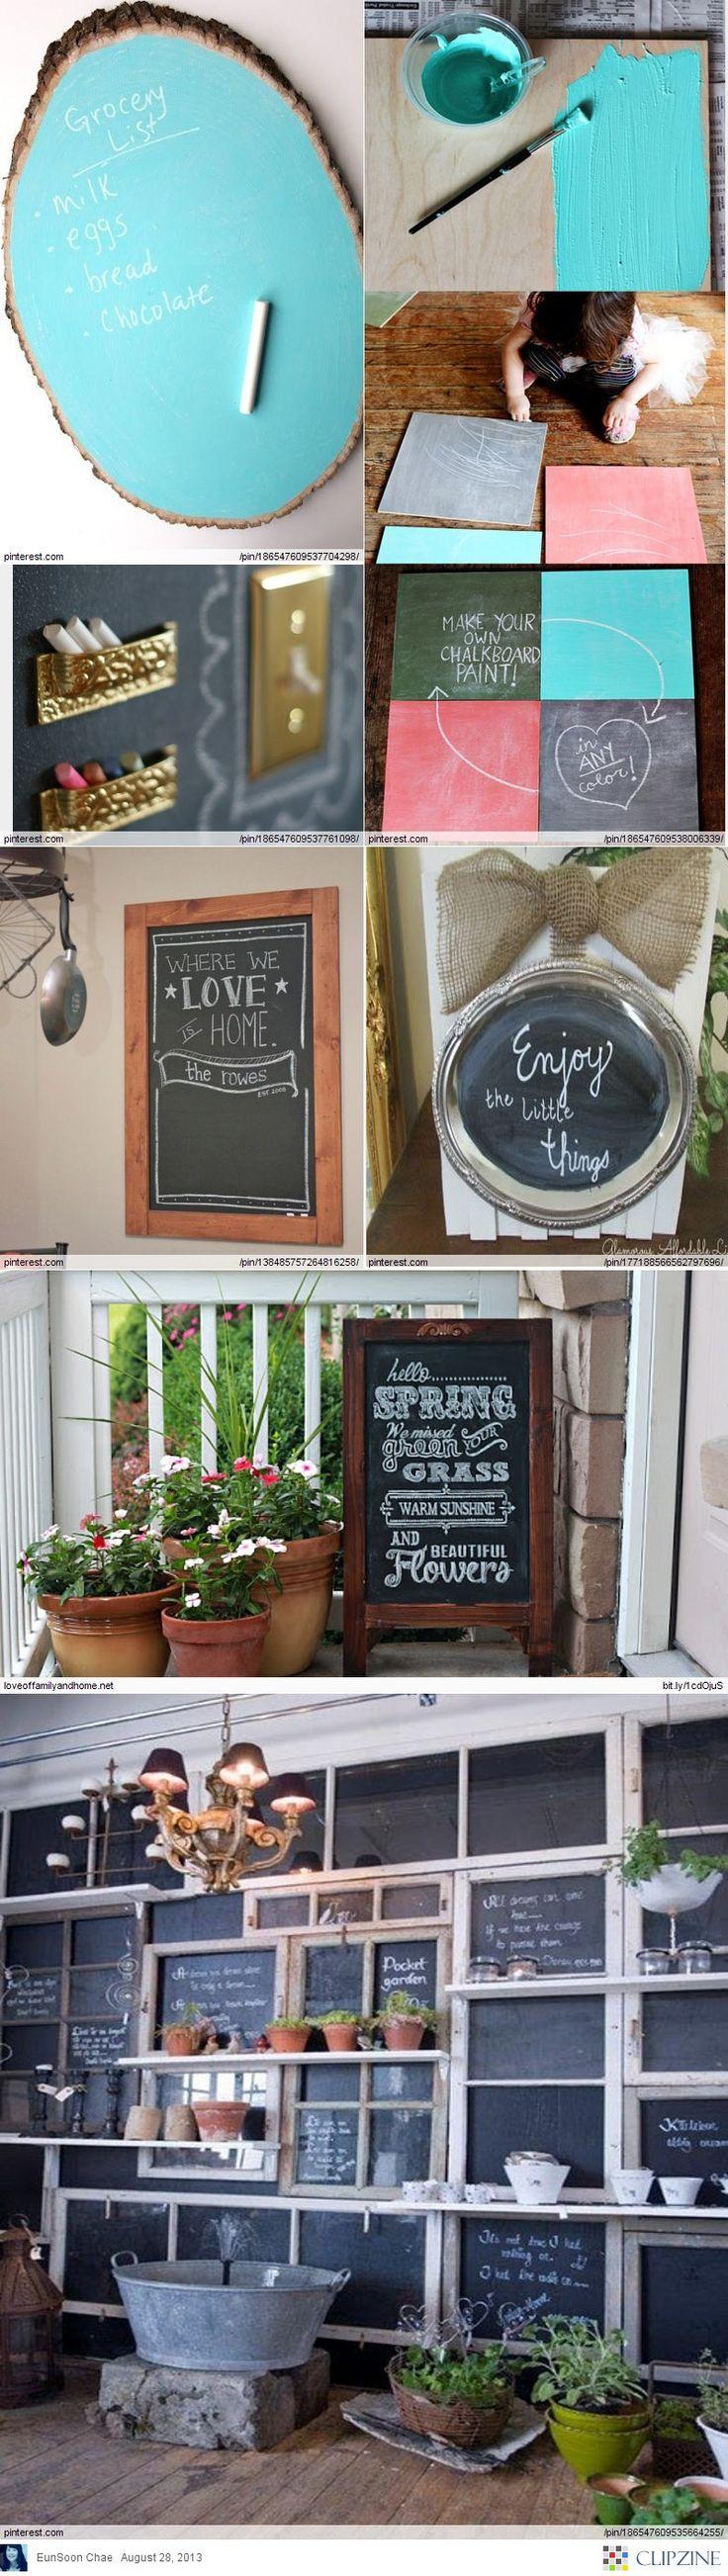 Diy Chalkboard Paint Ideas Home Decor Pinterest